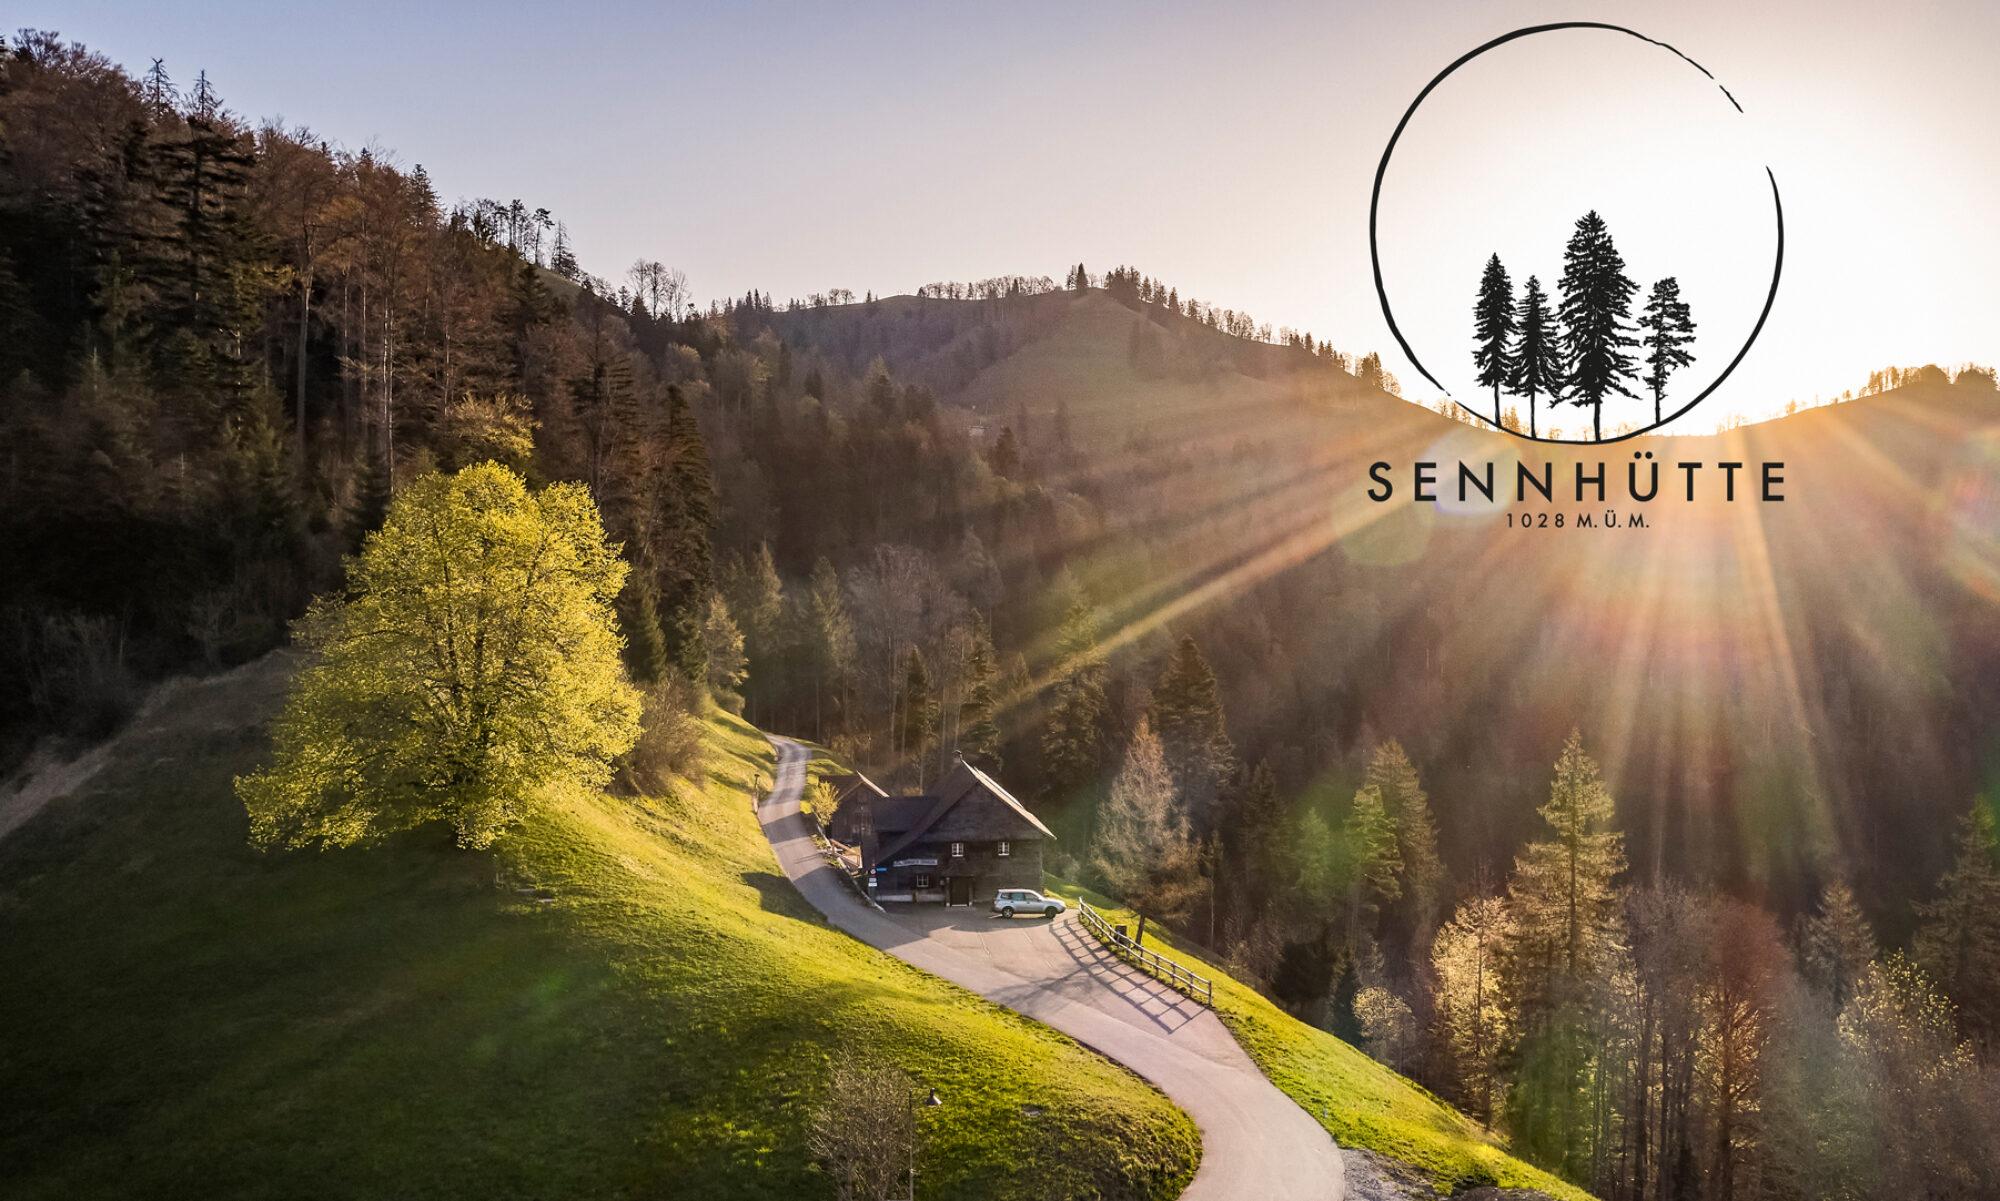 Berggasthaus Sennhütte